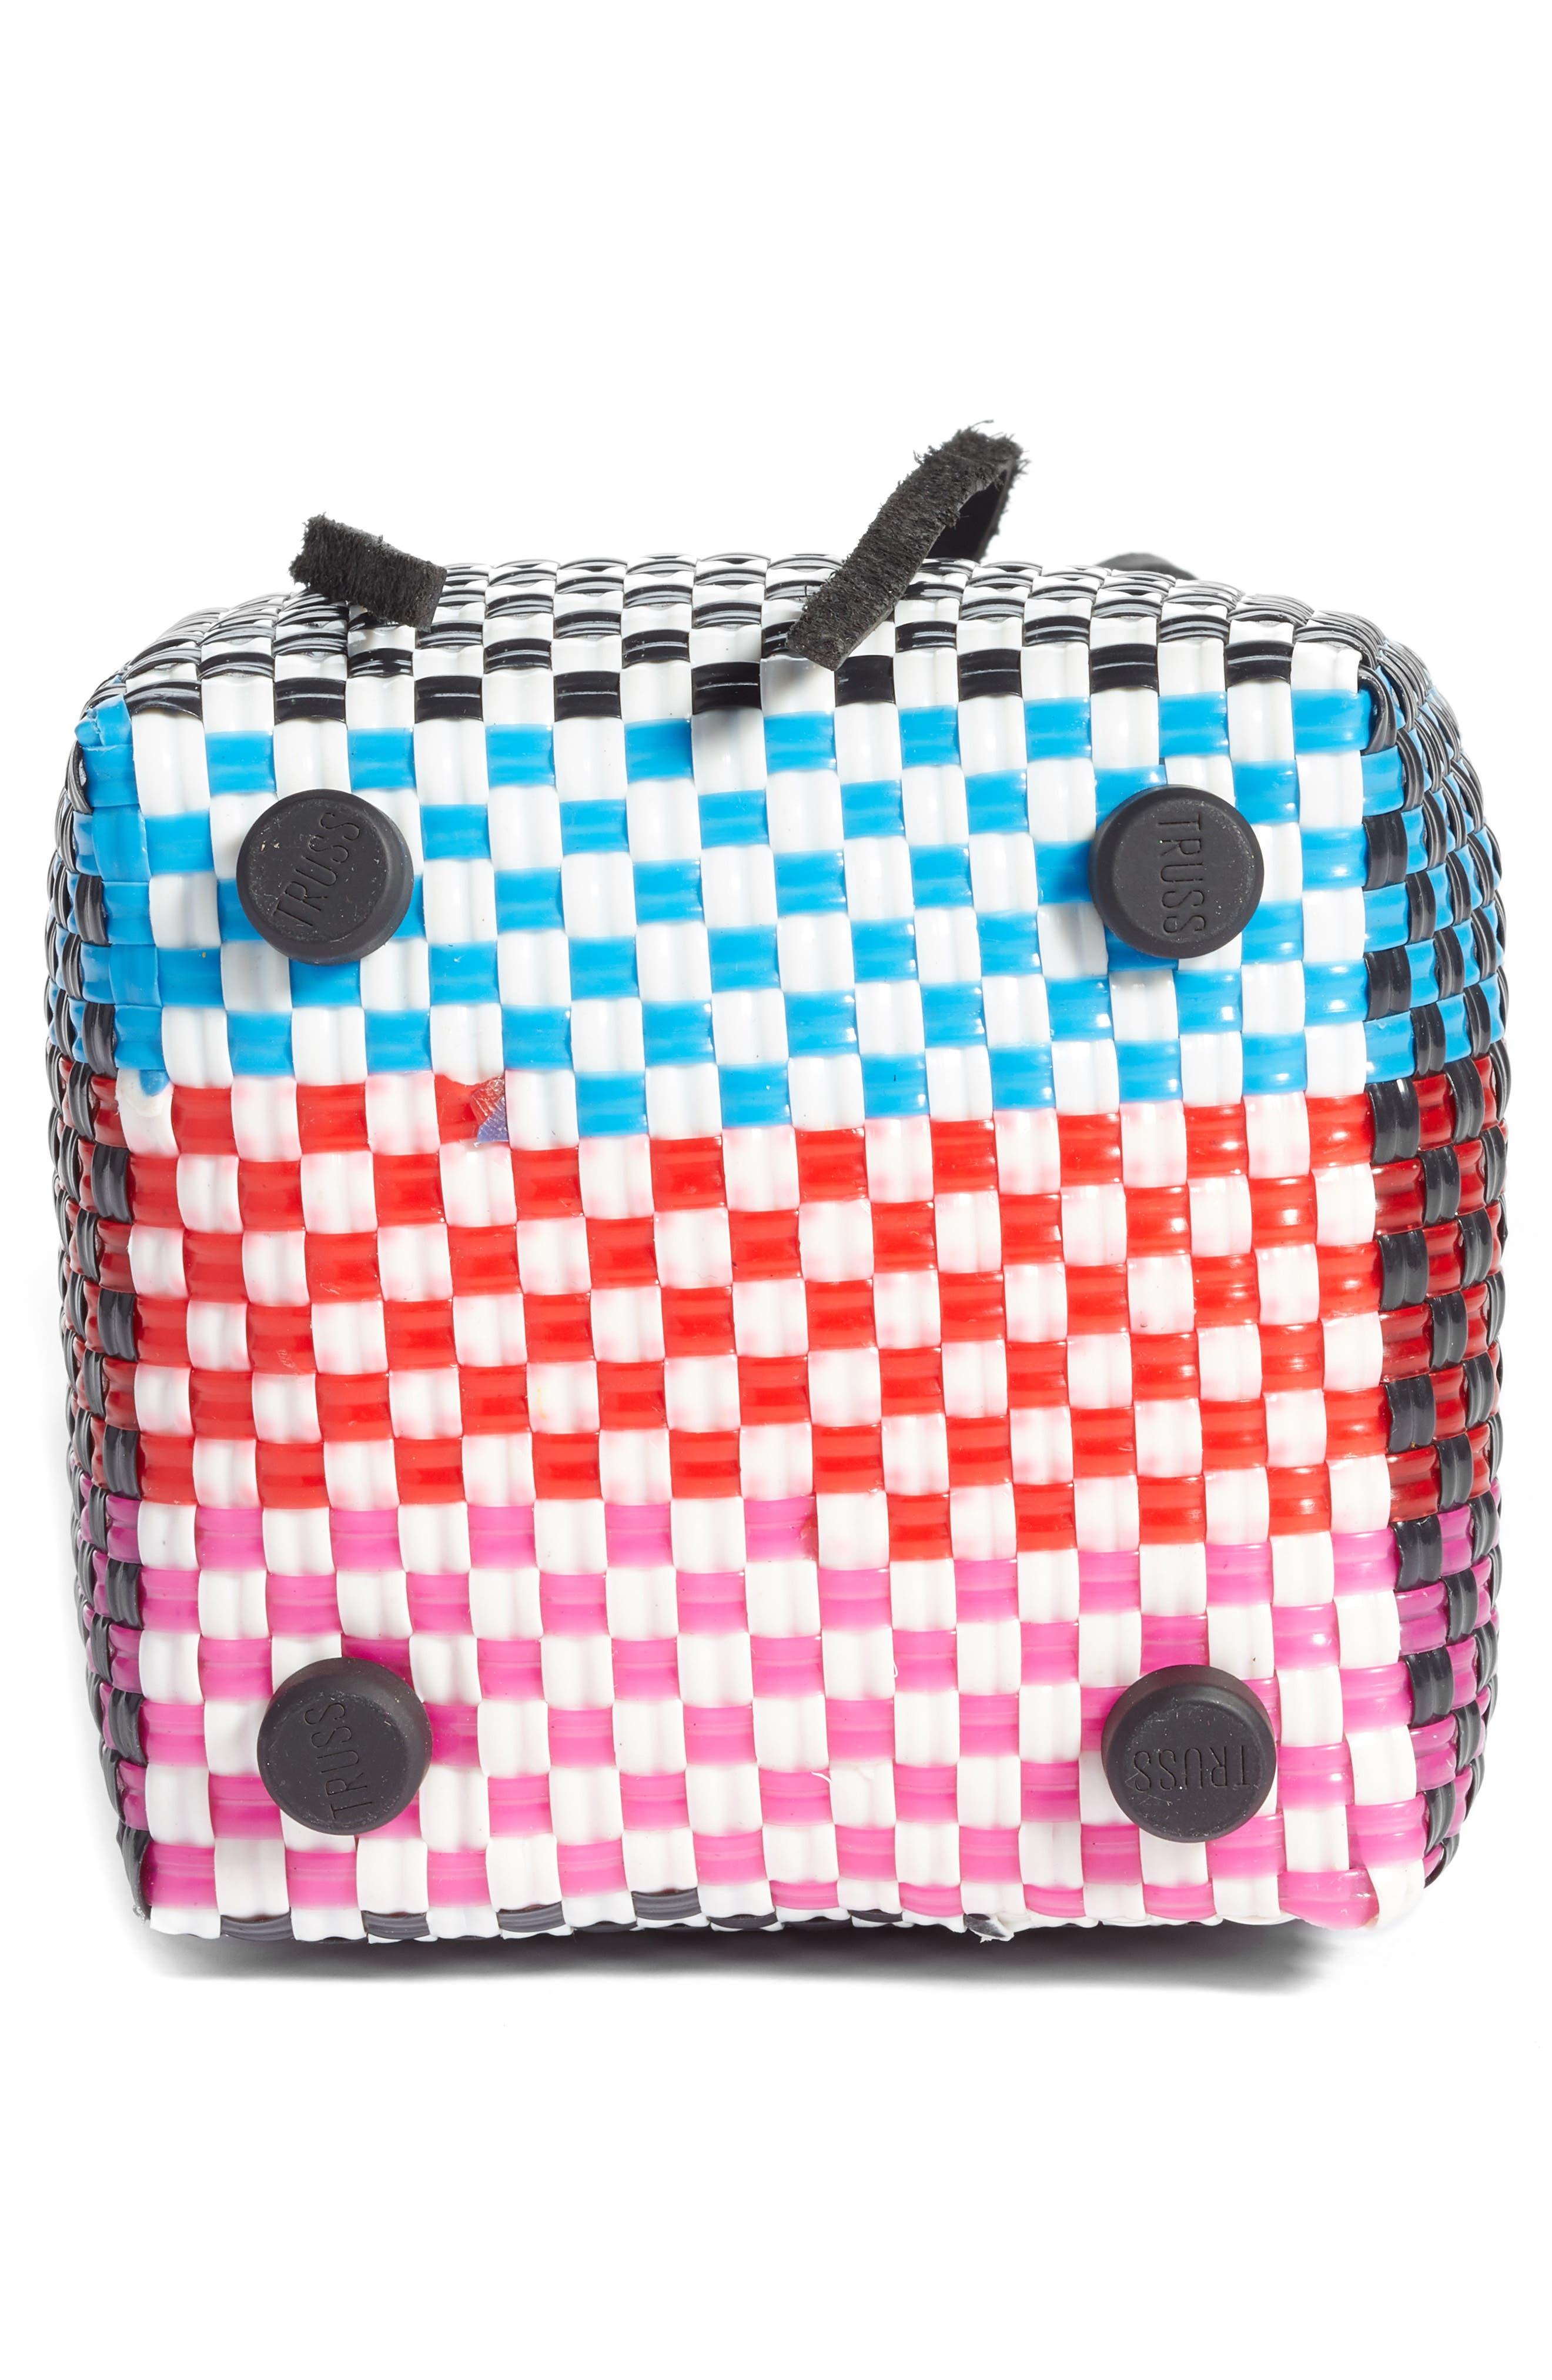 Party Woven Bucket Bag,                             Alternate thumbnail 6, color,                             960